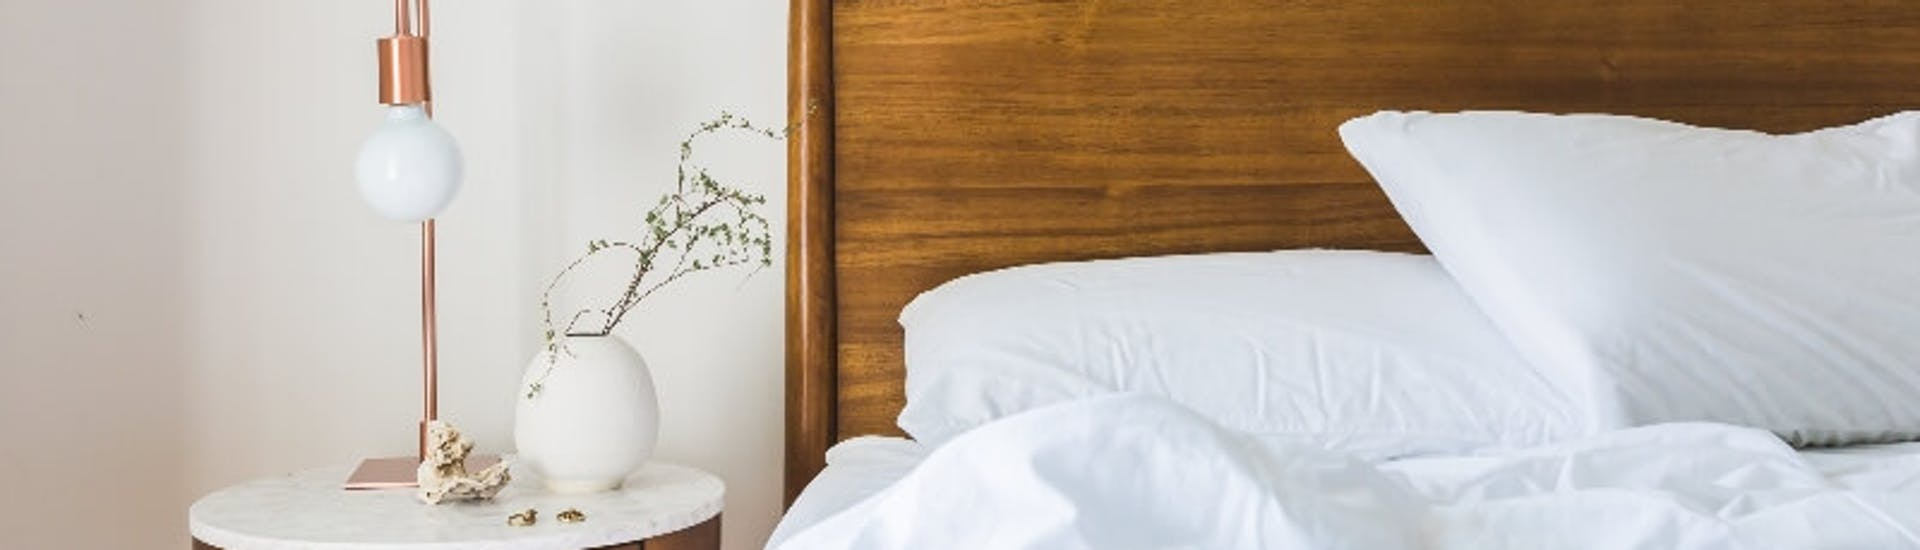 ka izveleties idealo gultu